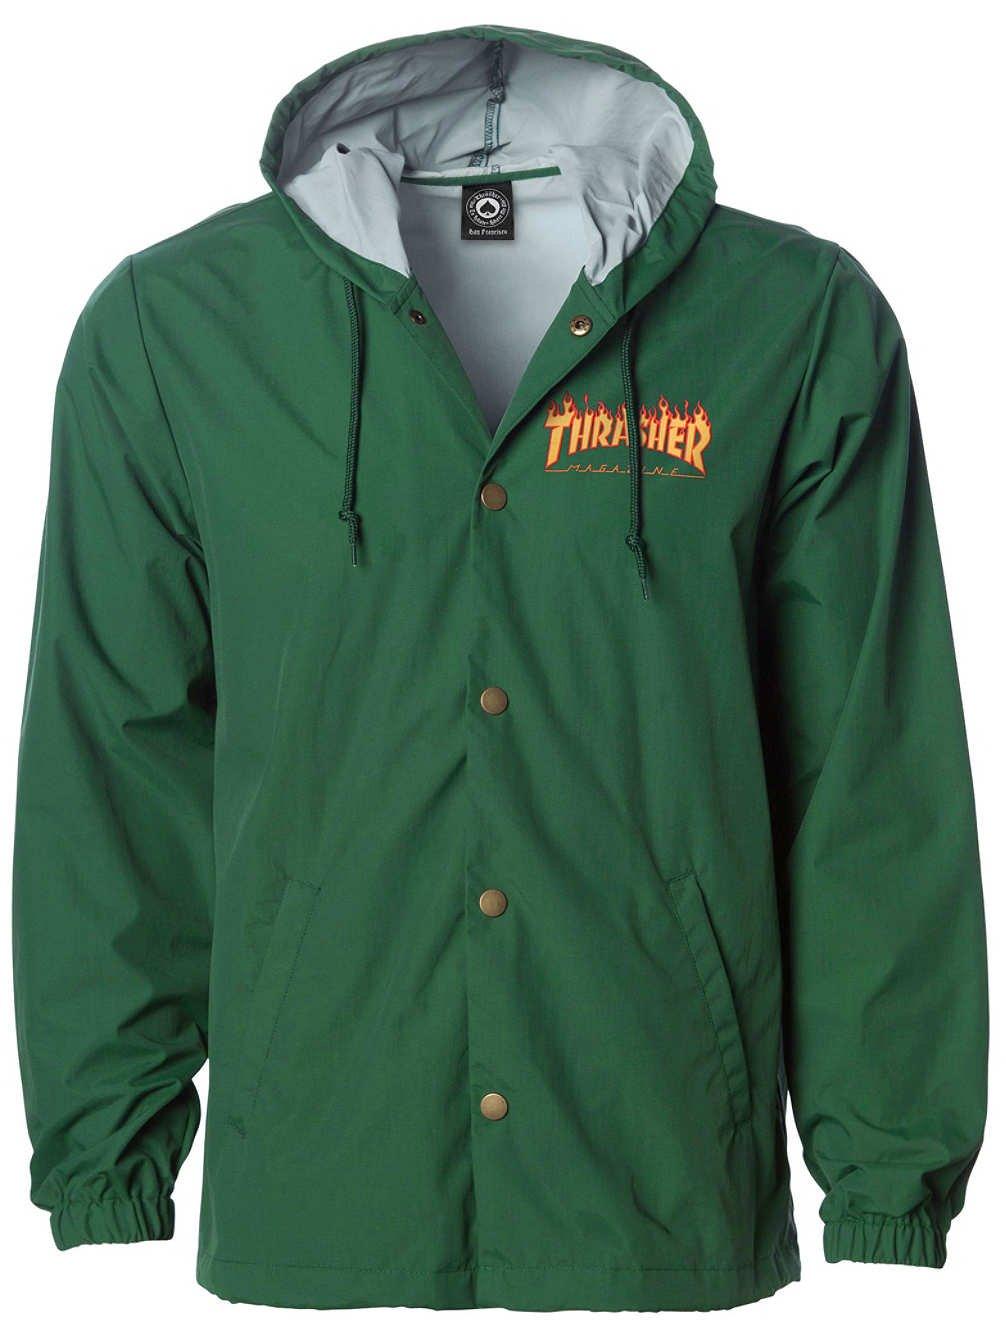 Thrasher Skateboard Magazine Flame Logo Hooded Coach Jacket (Green) (Large)